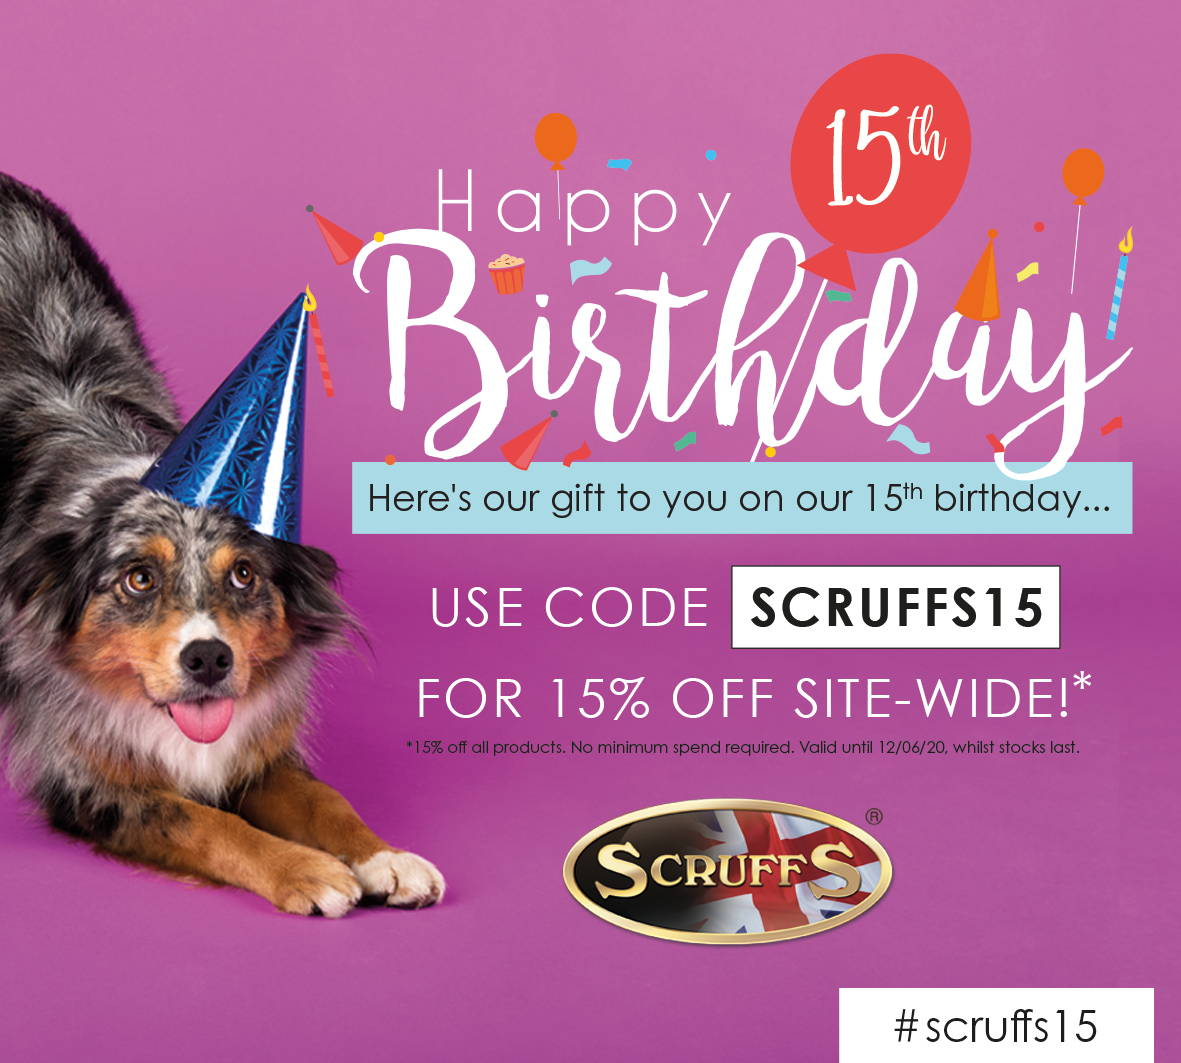 Scruffs 15th birthday 15% off site-wide sale